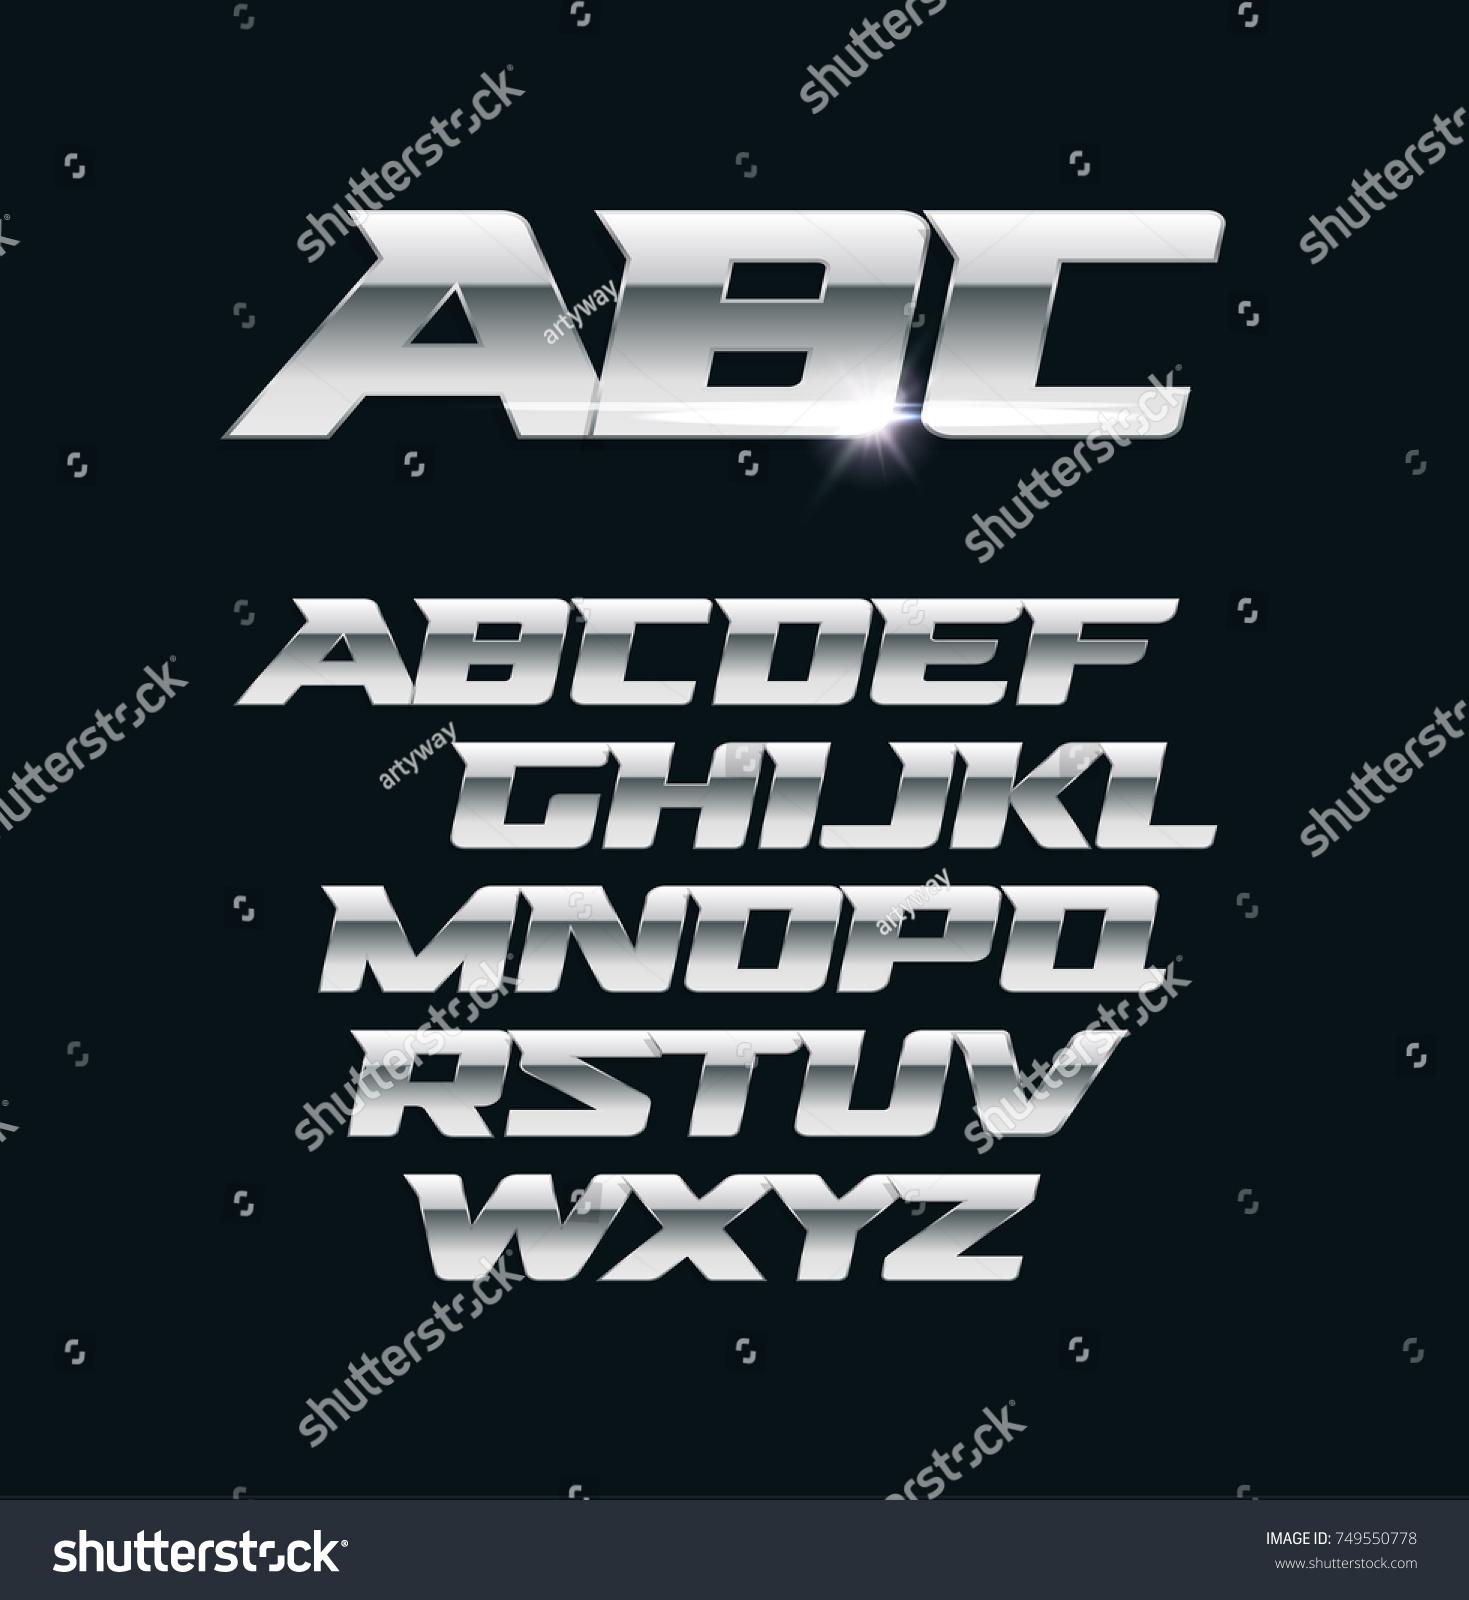 Modern chrome vector font metallic letters polished steel style symbols aluminium bold geometric